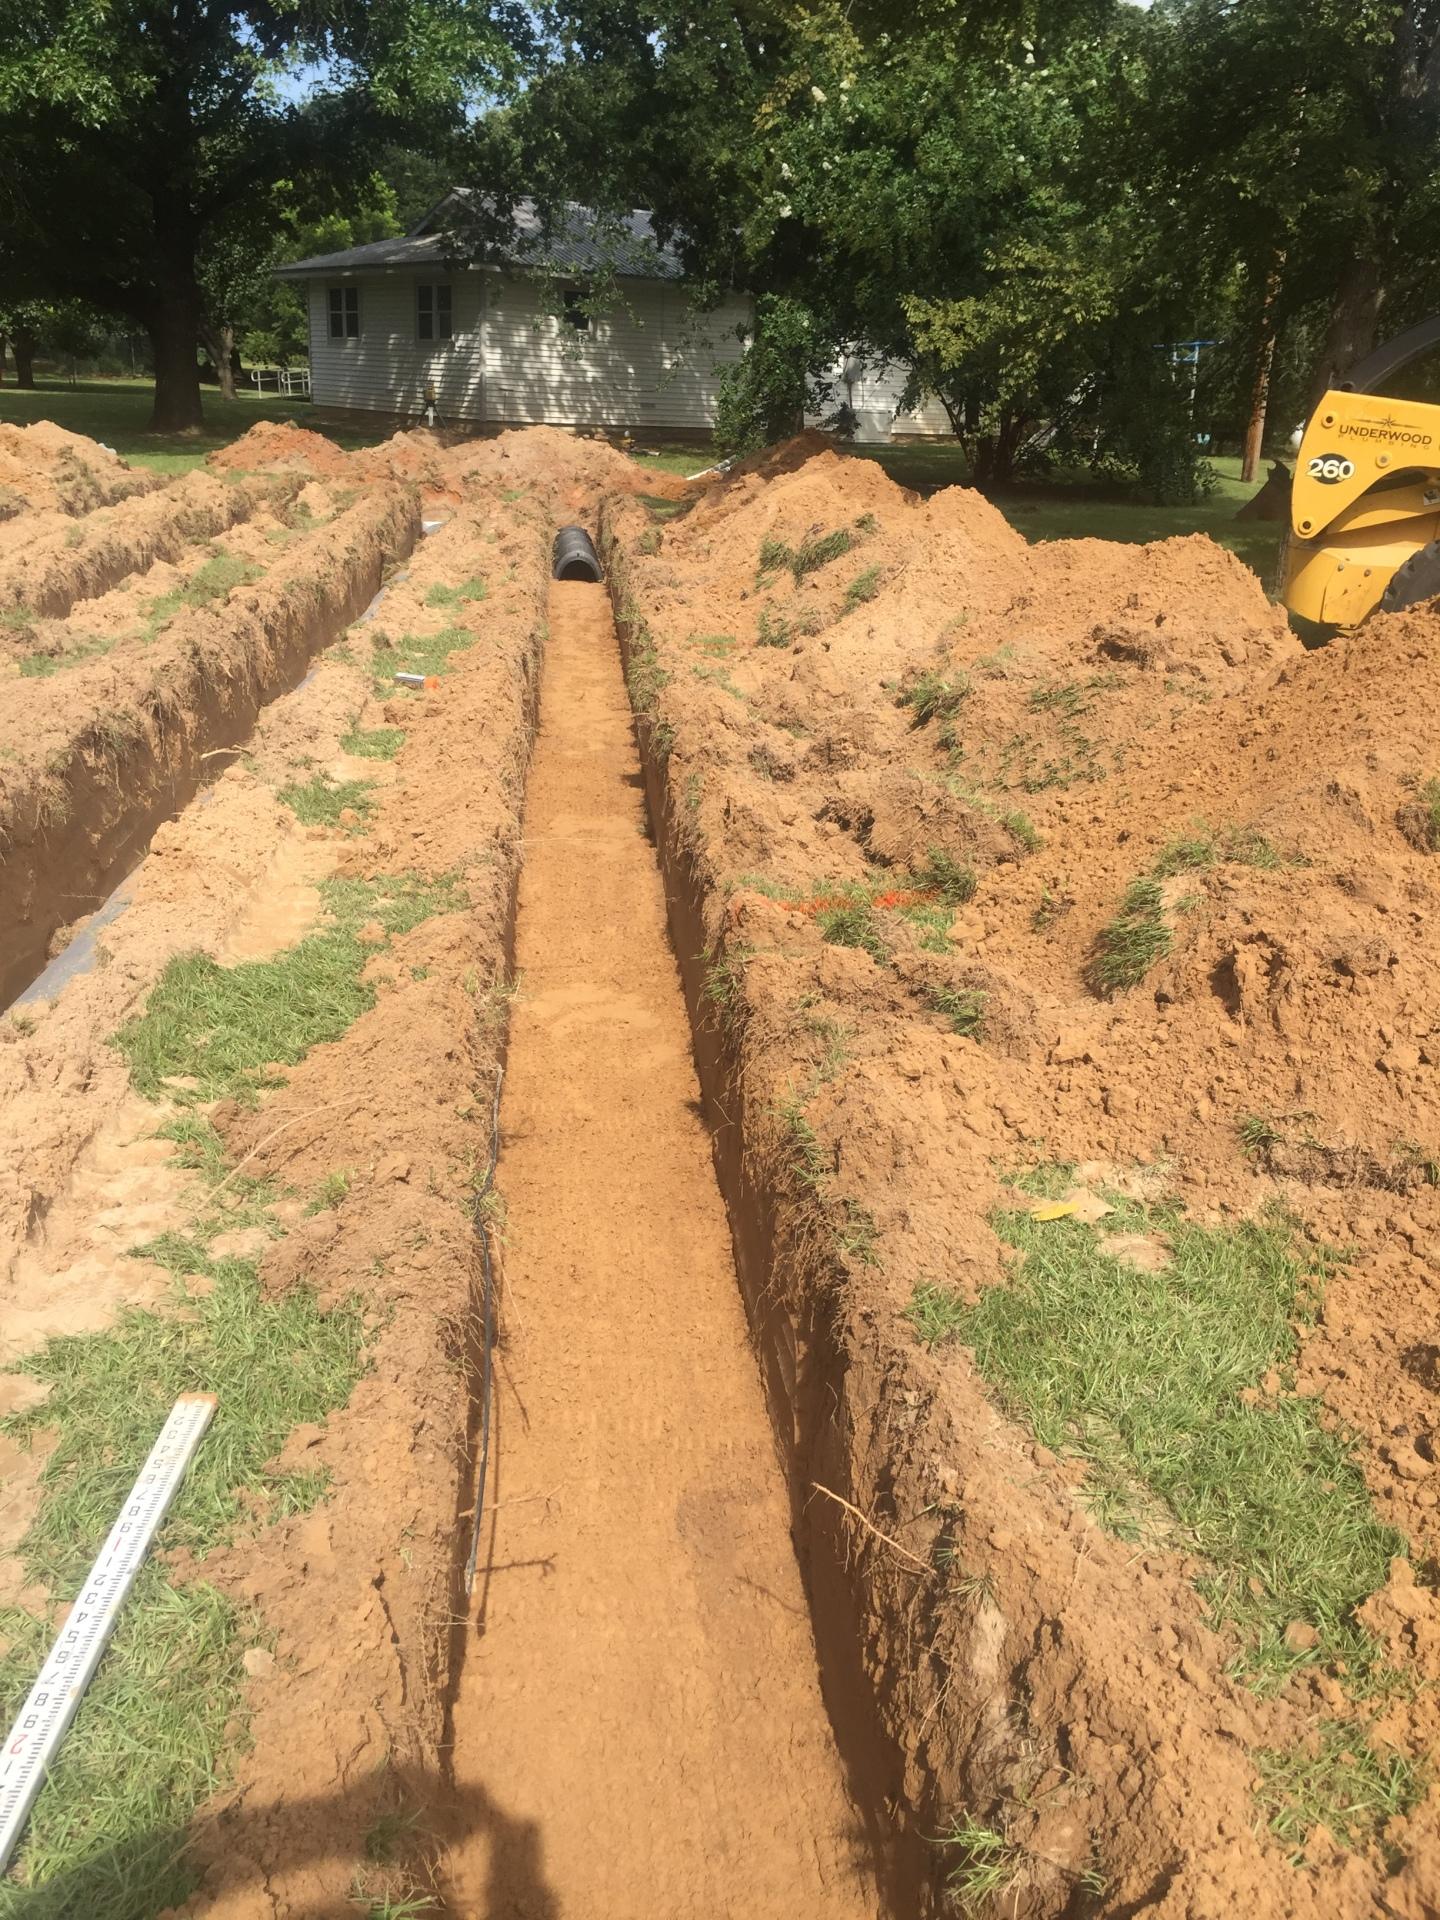 Underwood Plumbing